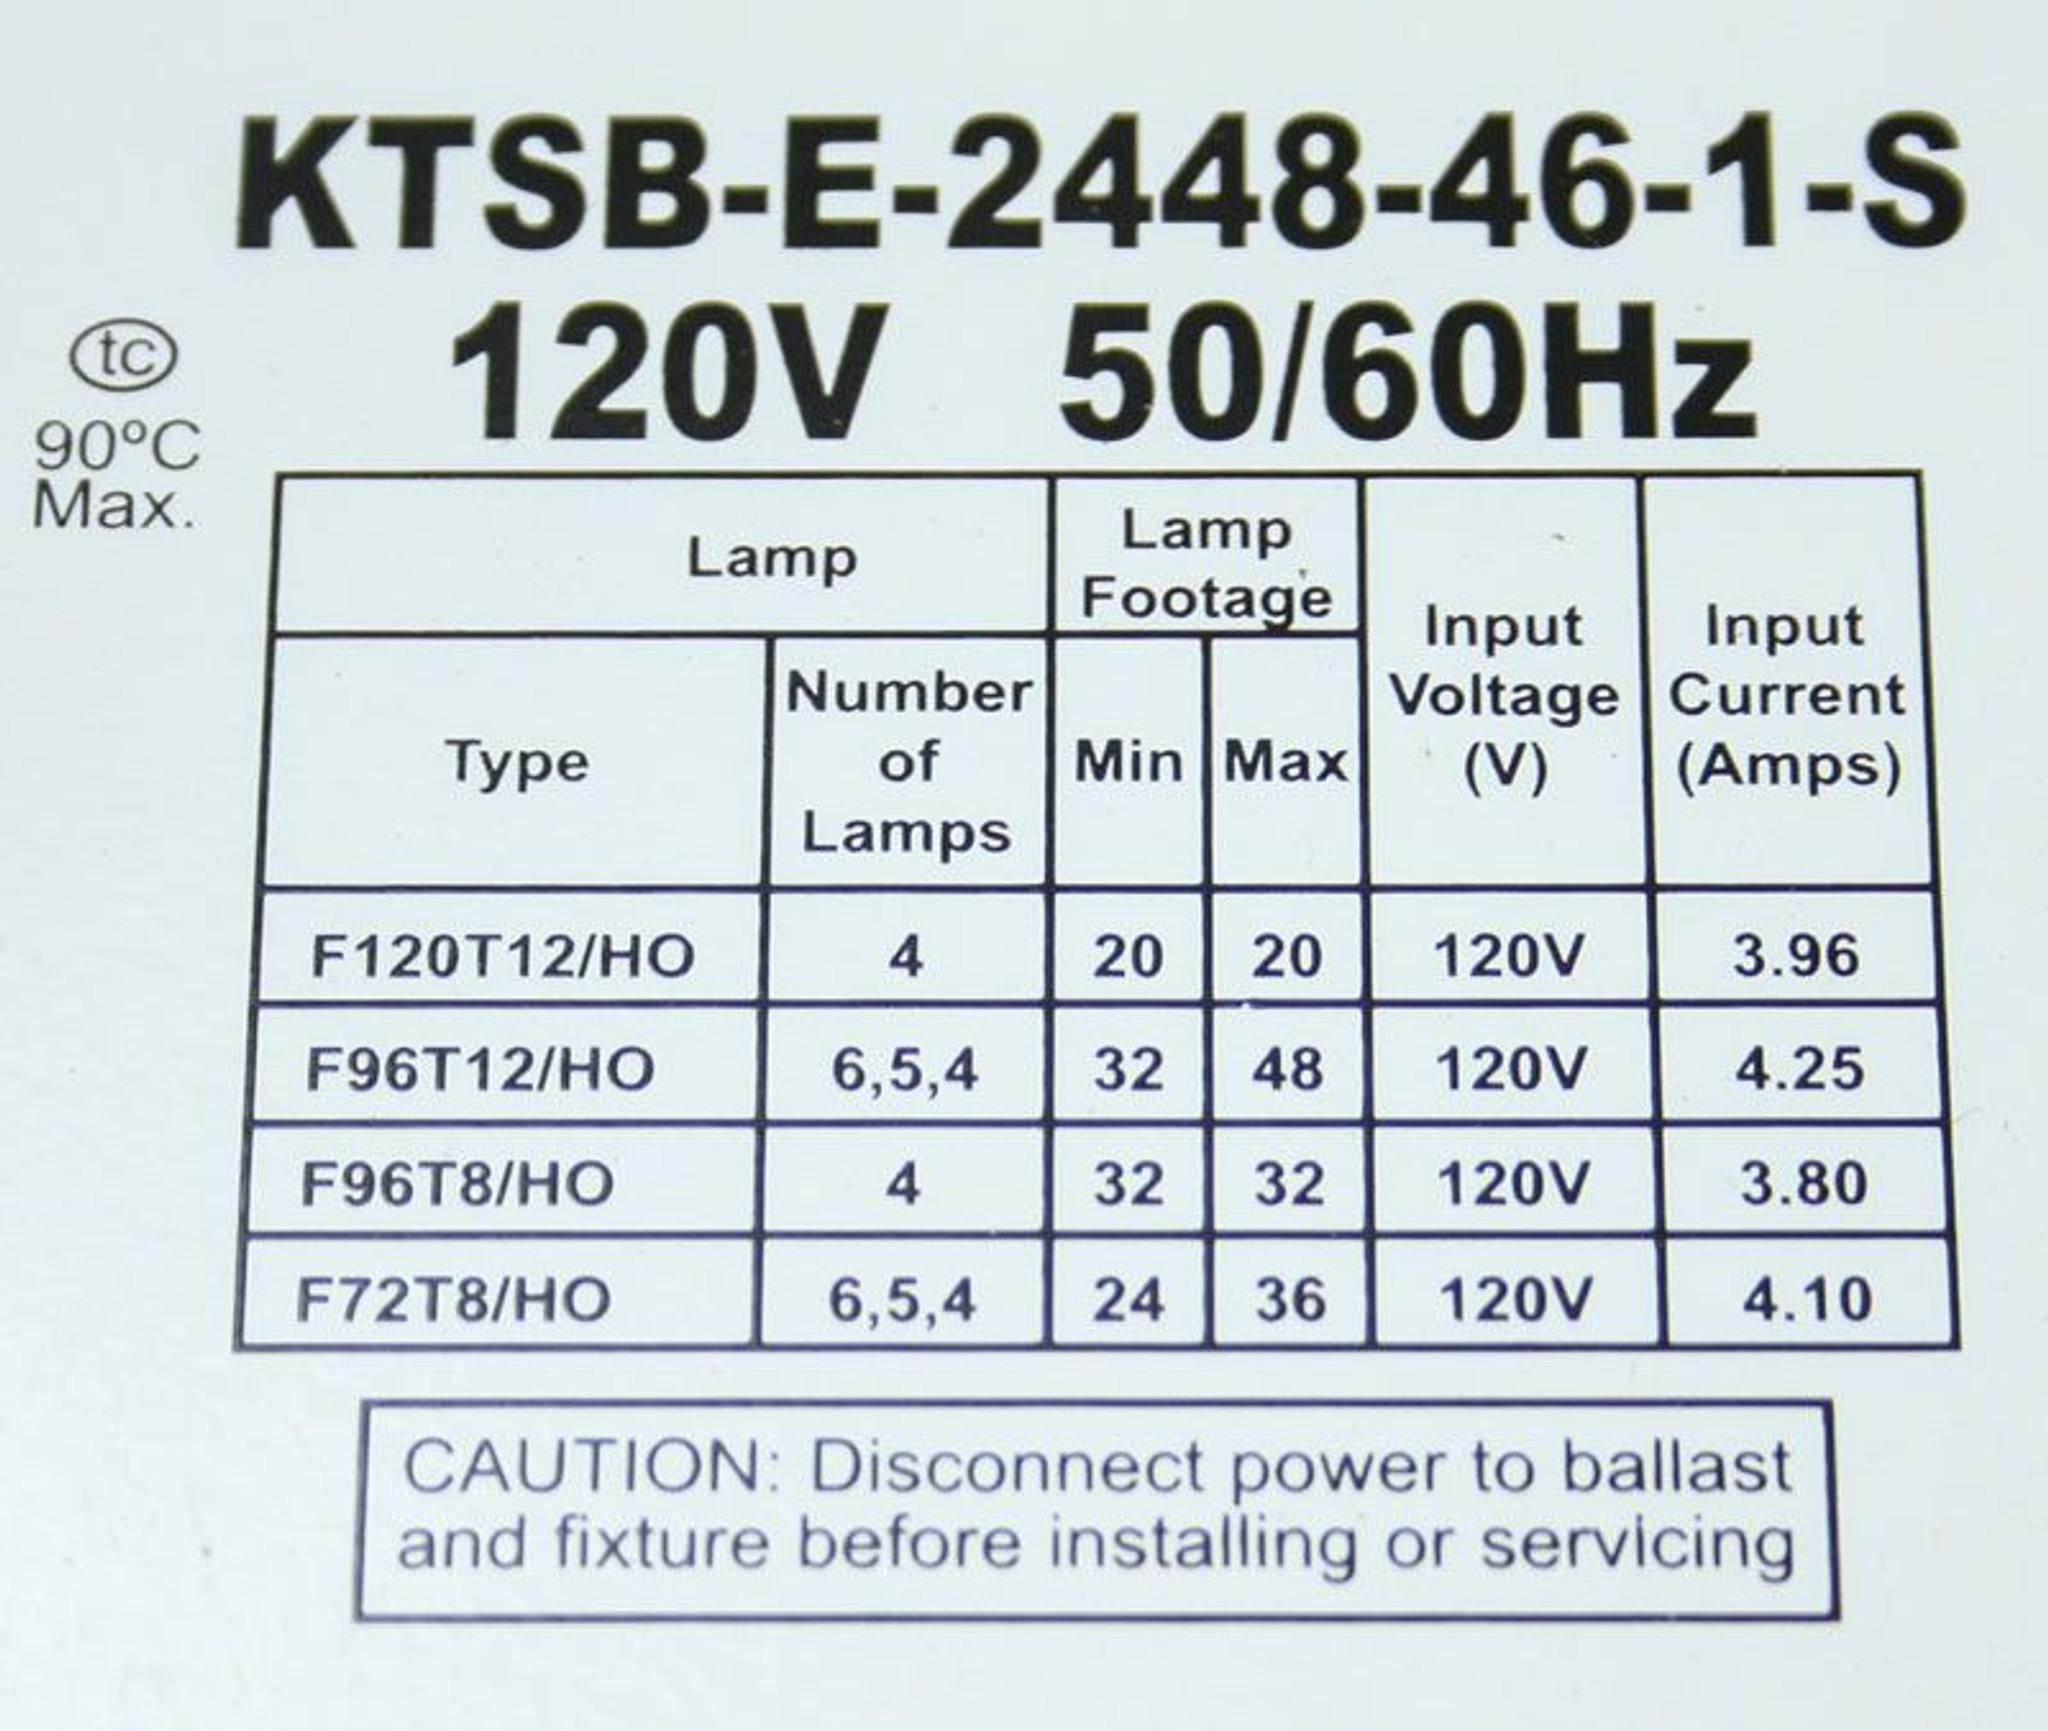 Keystone KTSB-E-2448-46-1-S Electronic Sign Ballast 120V on